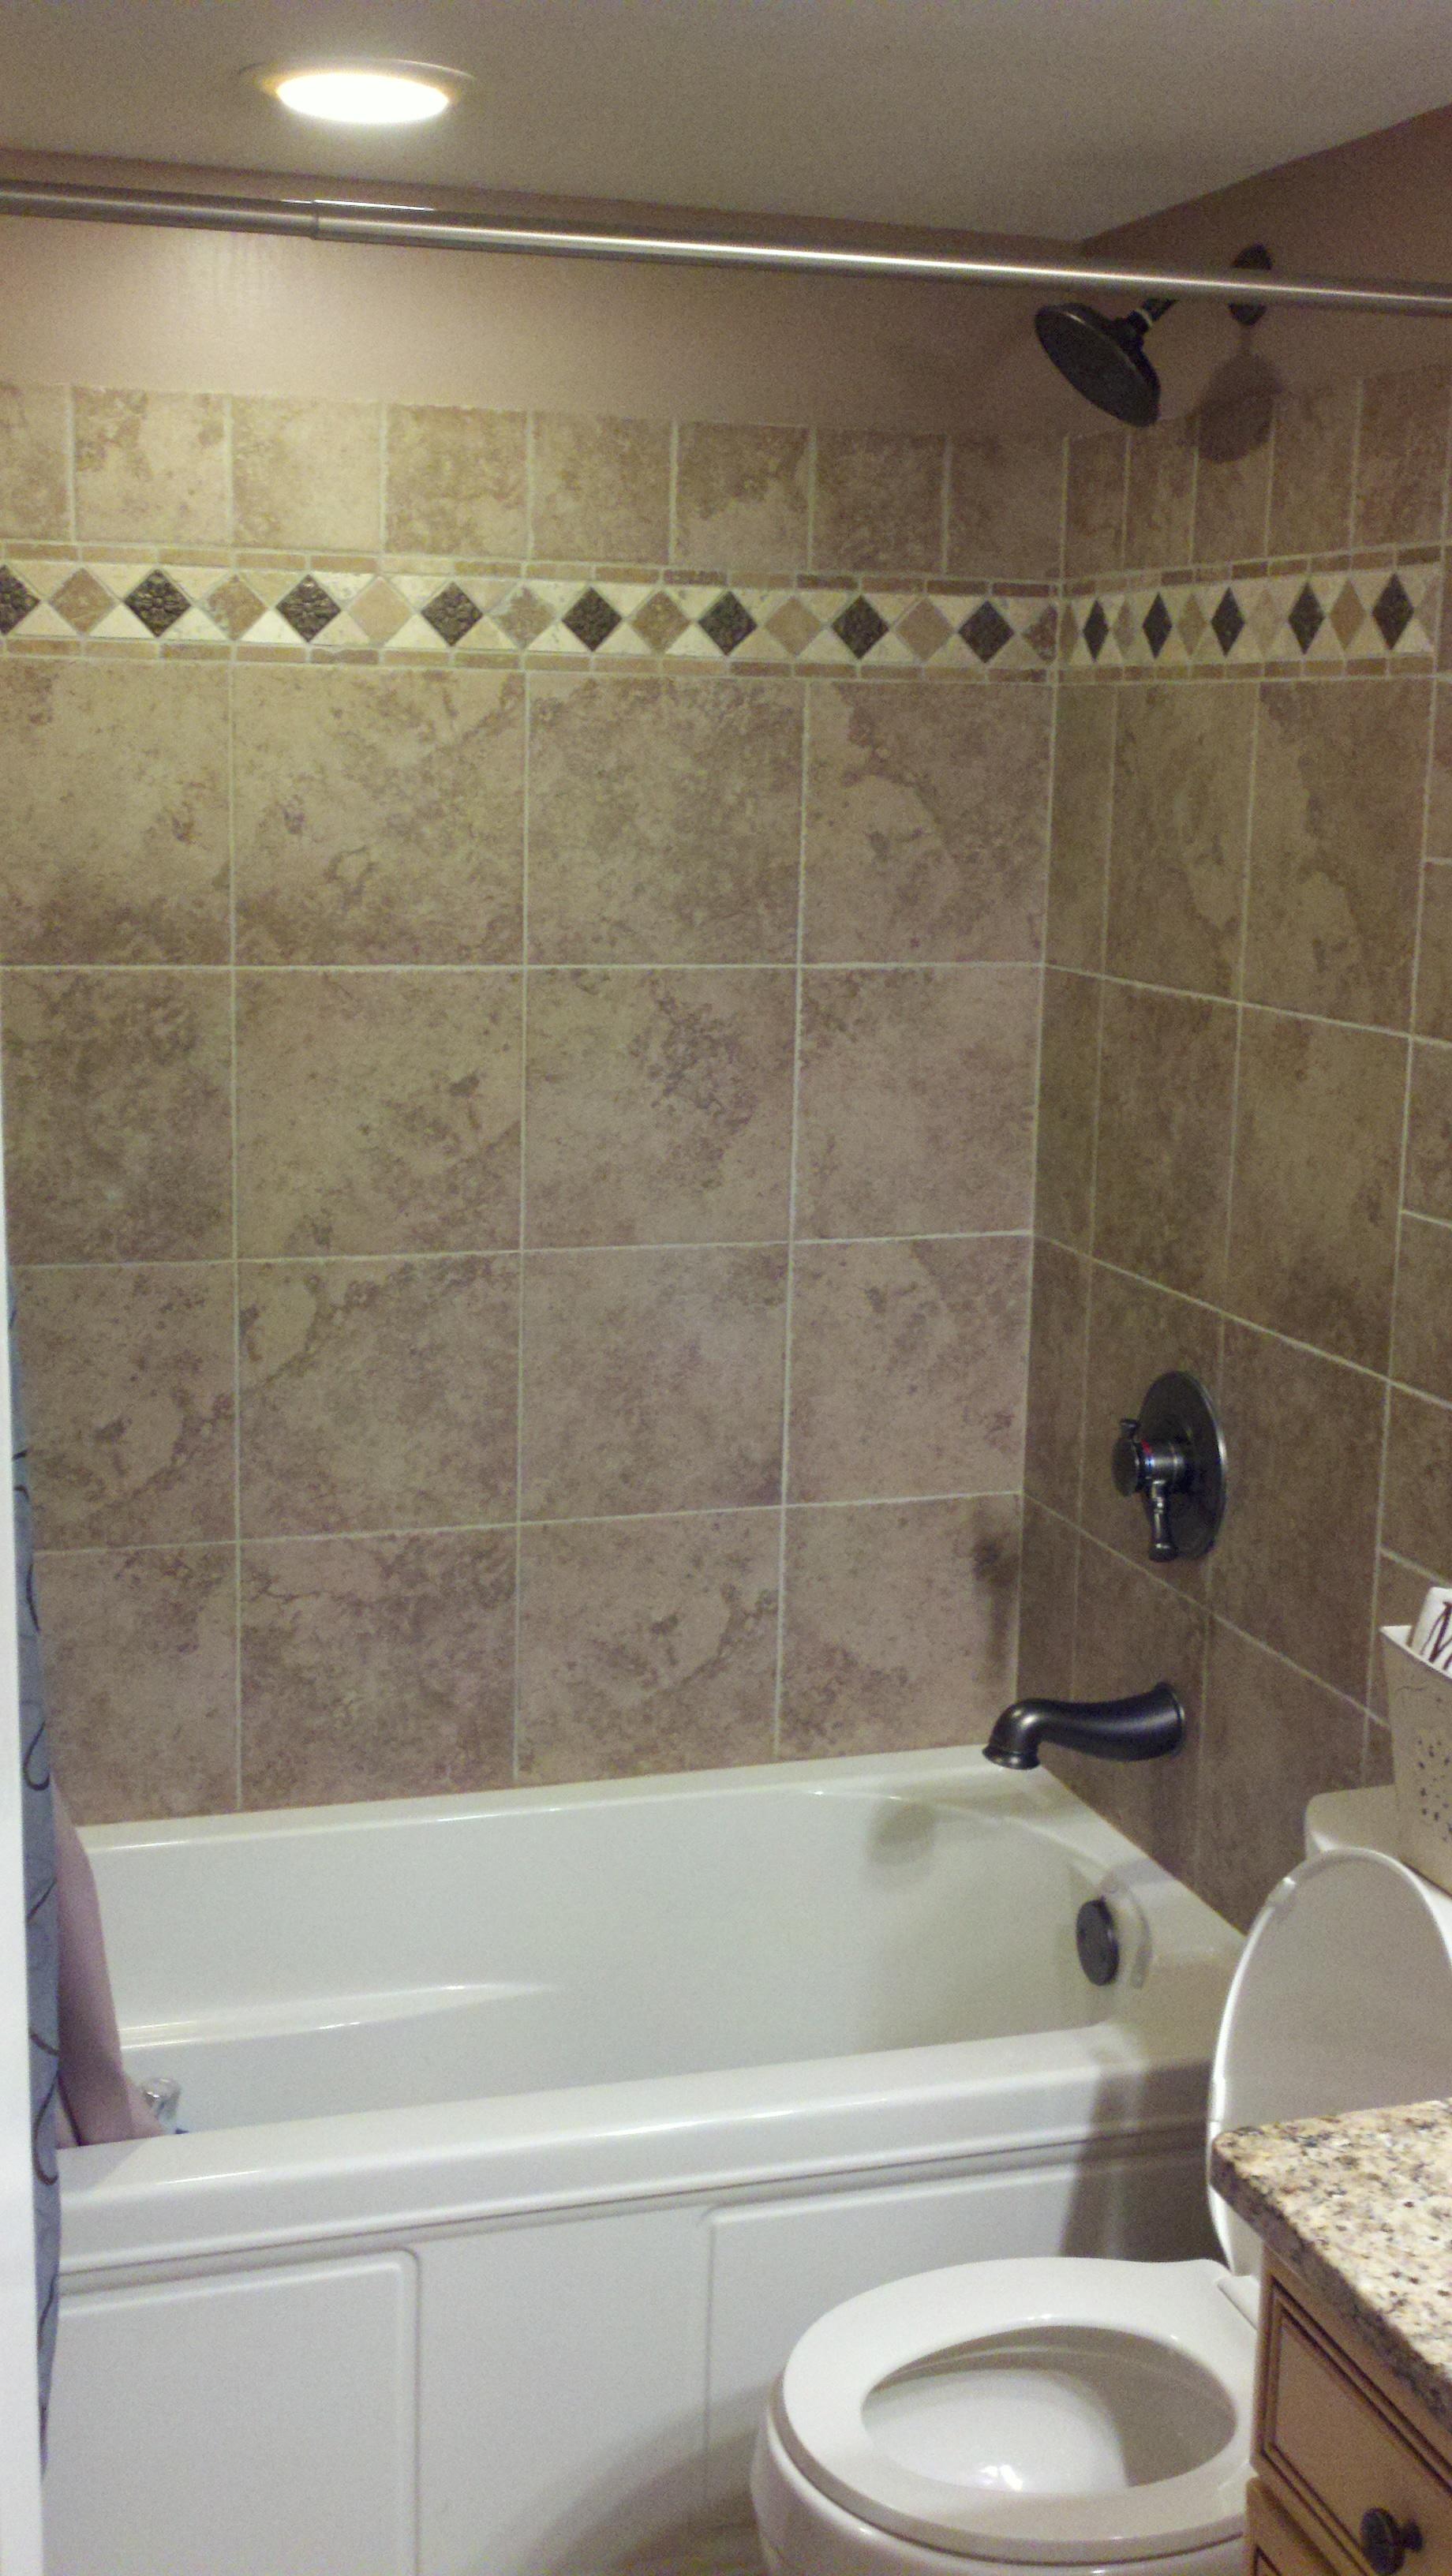 Williamsburg Bathroom Sink Install